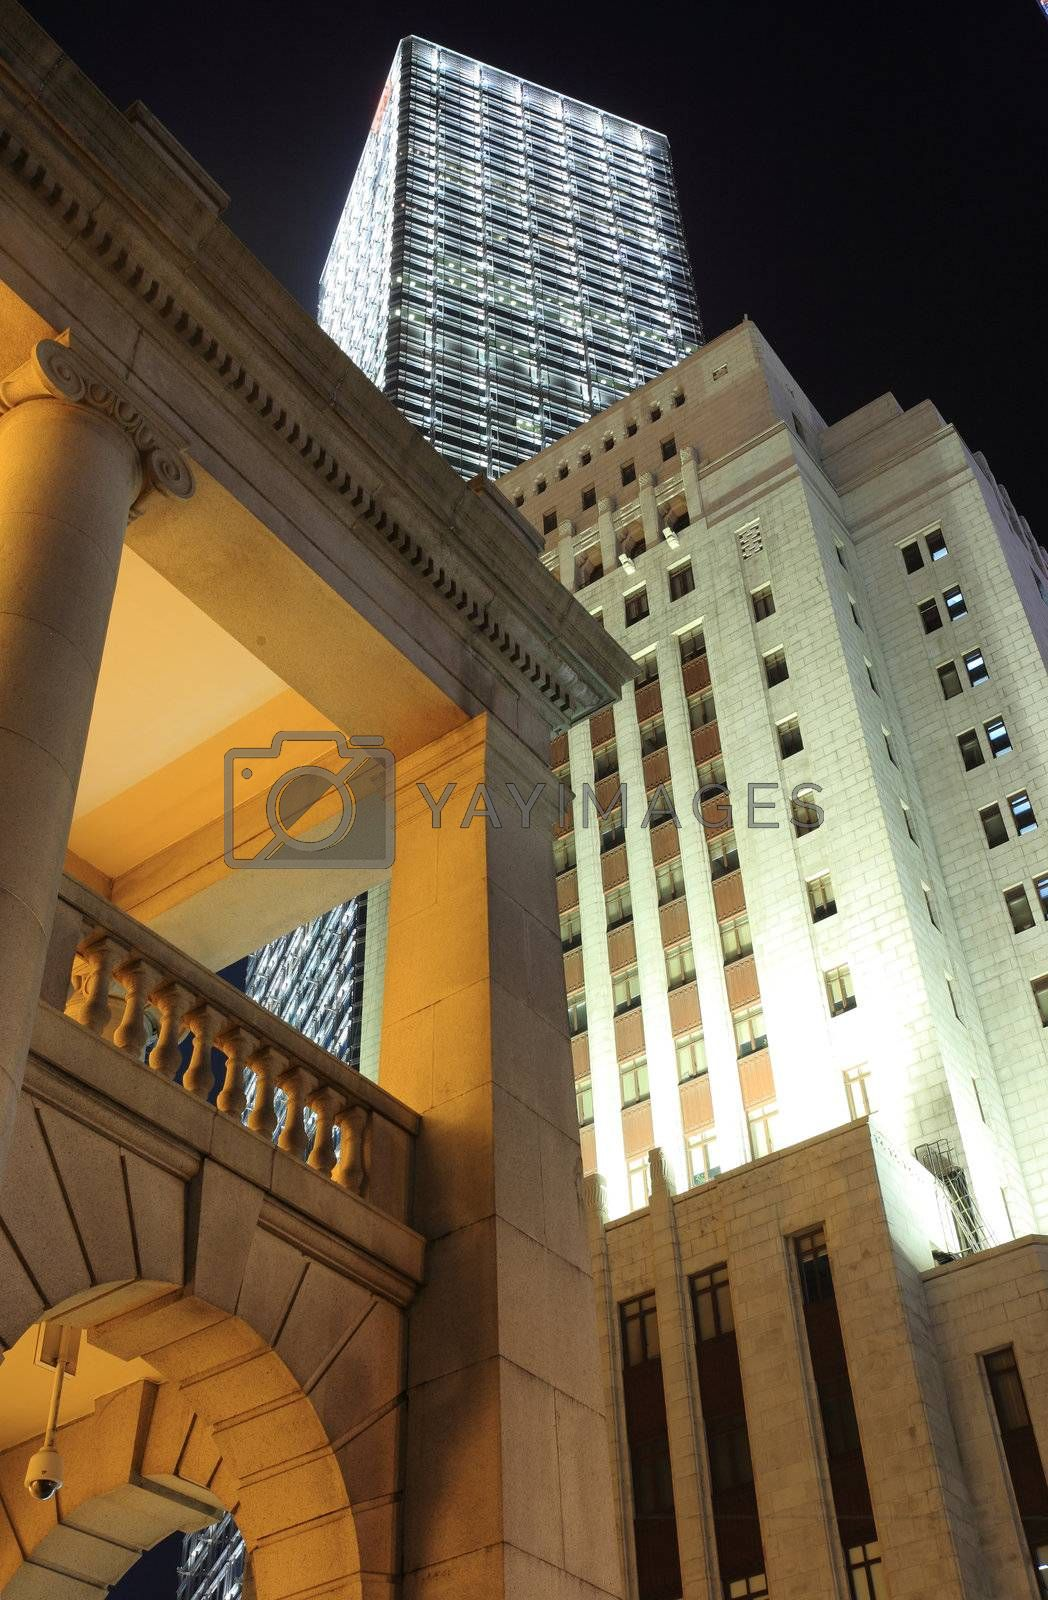 Hong Kong At Night with old and new buildings by leungchopan